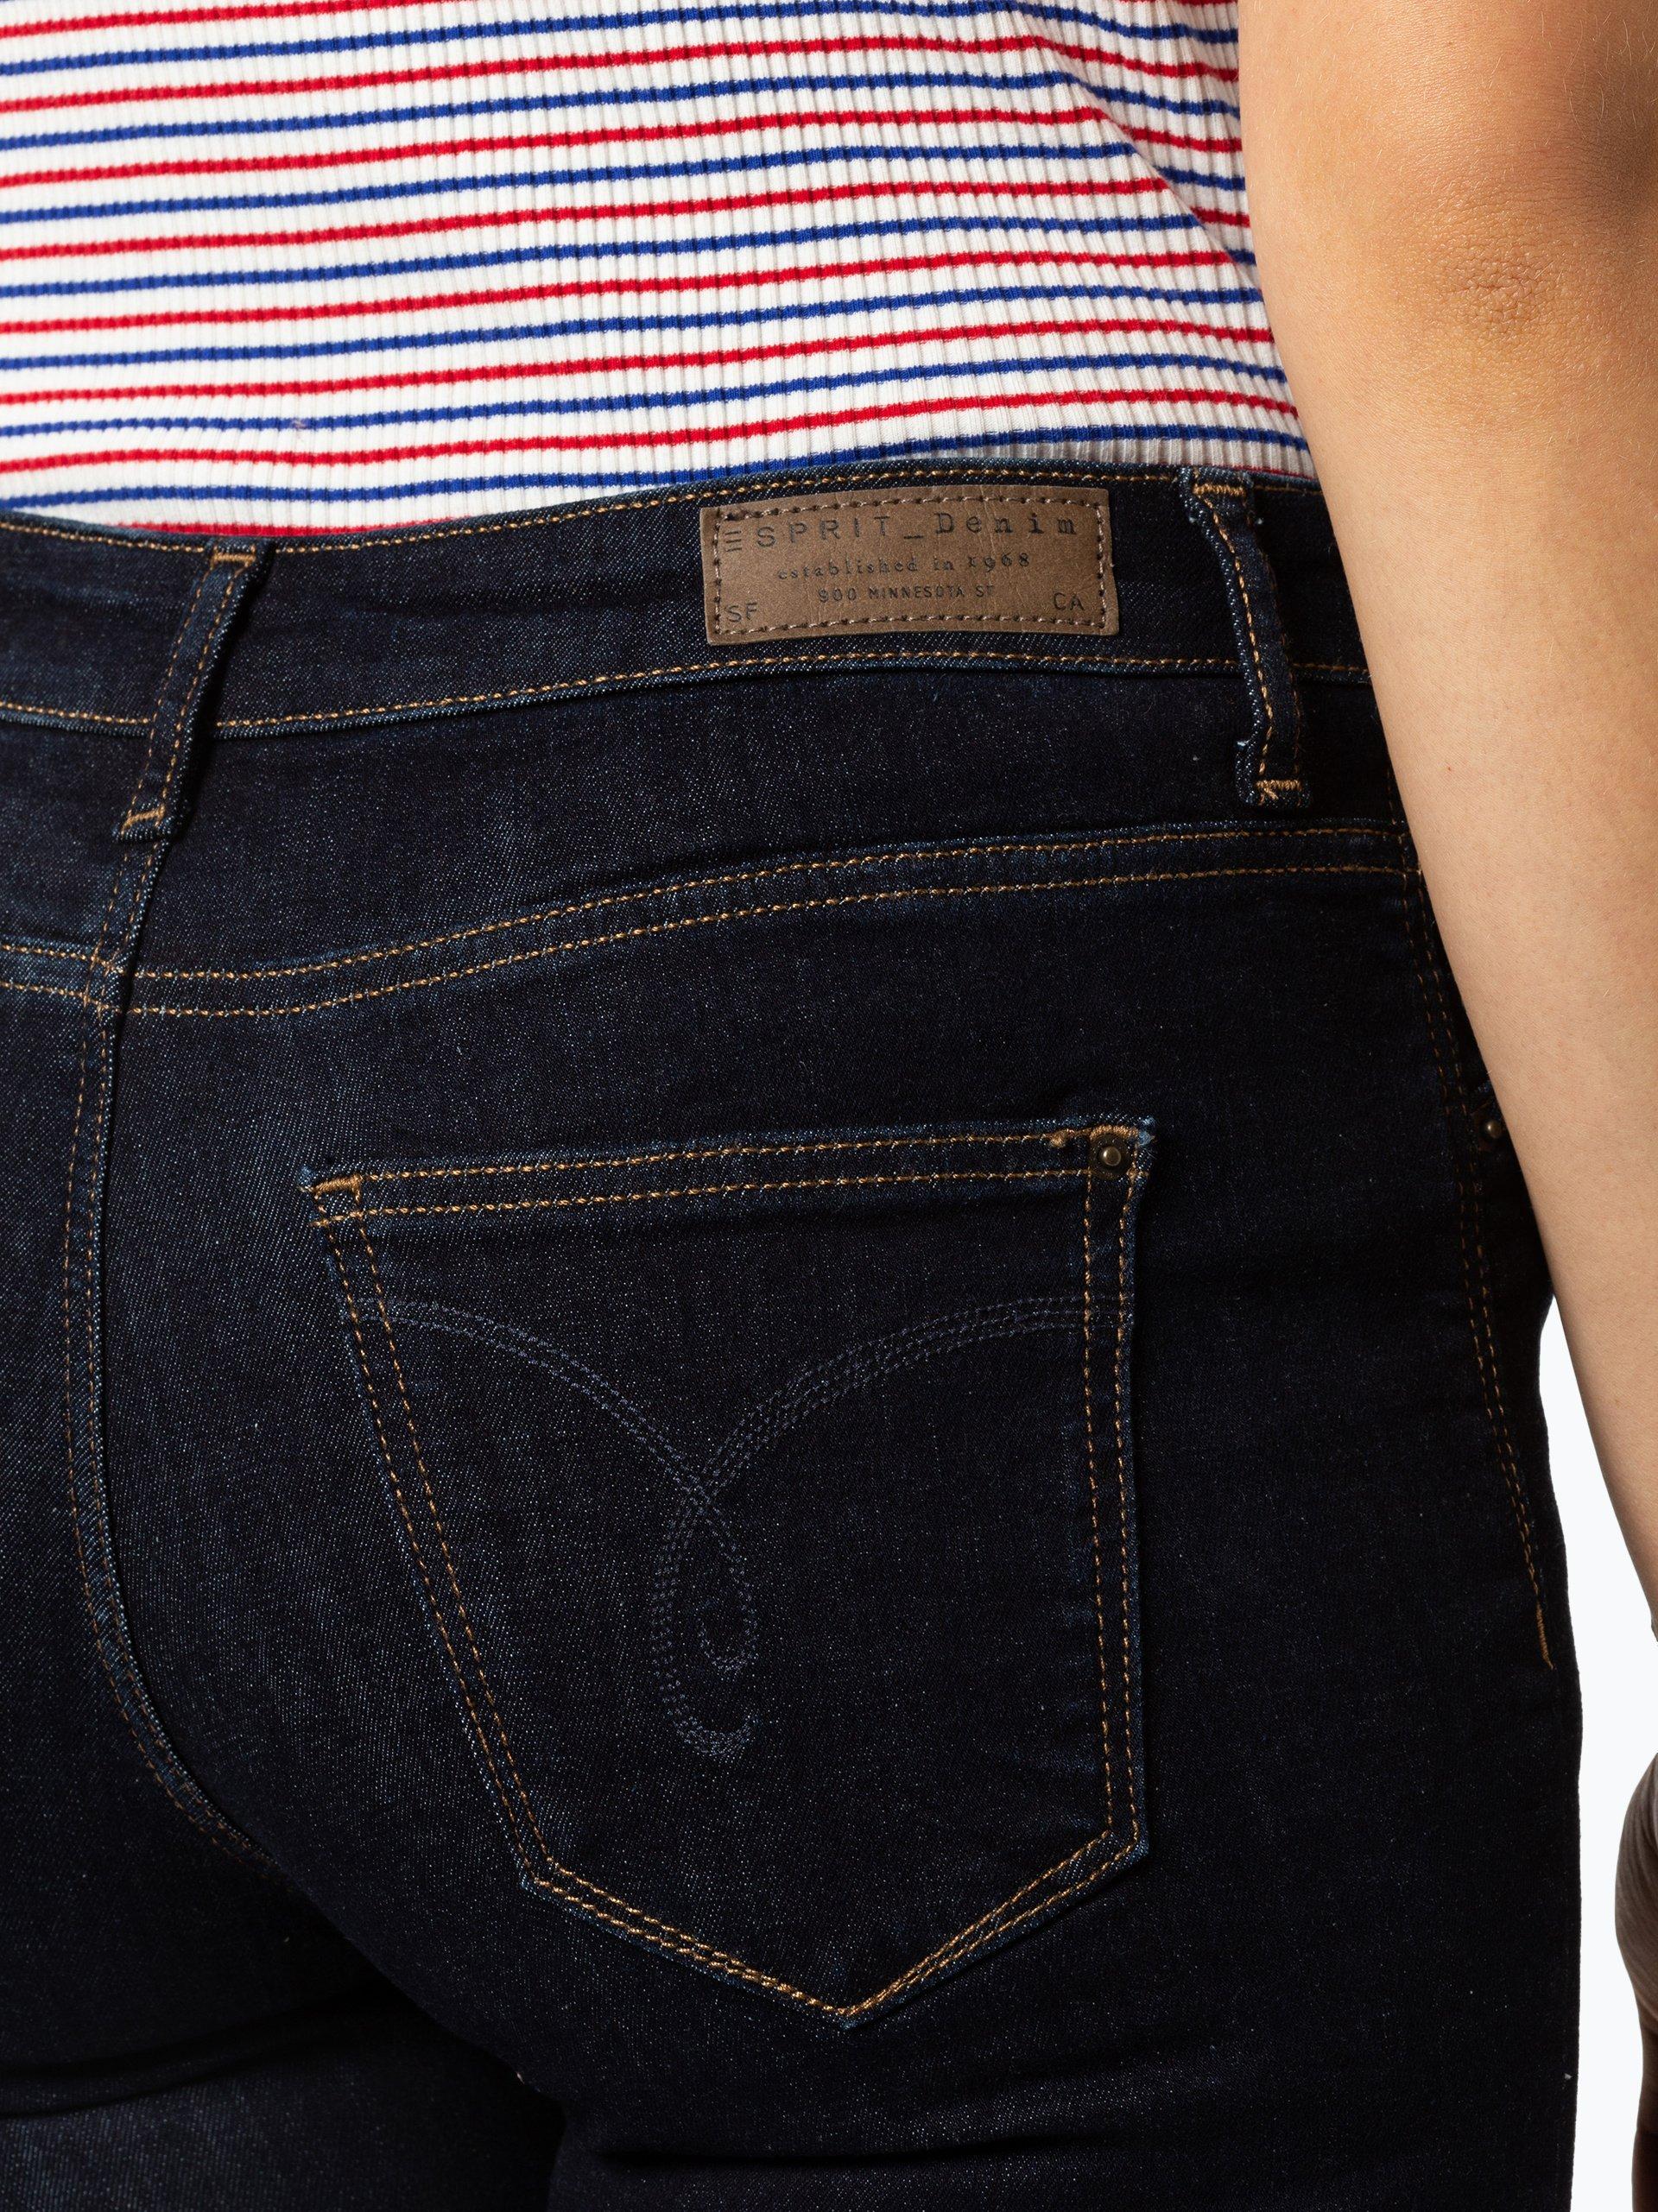 Esprit Casual Damen Jeans